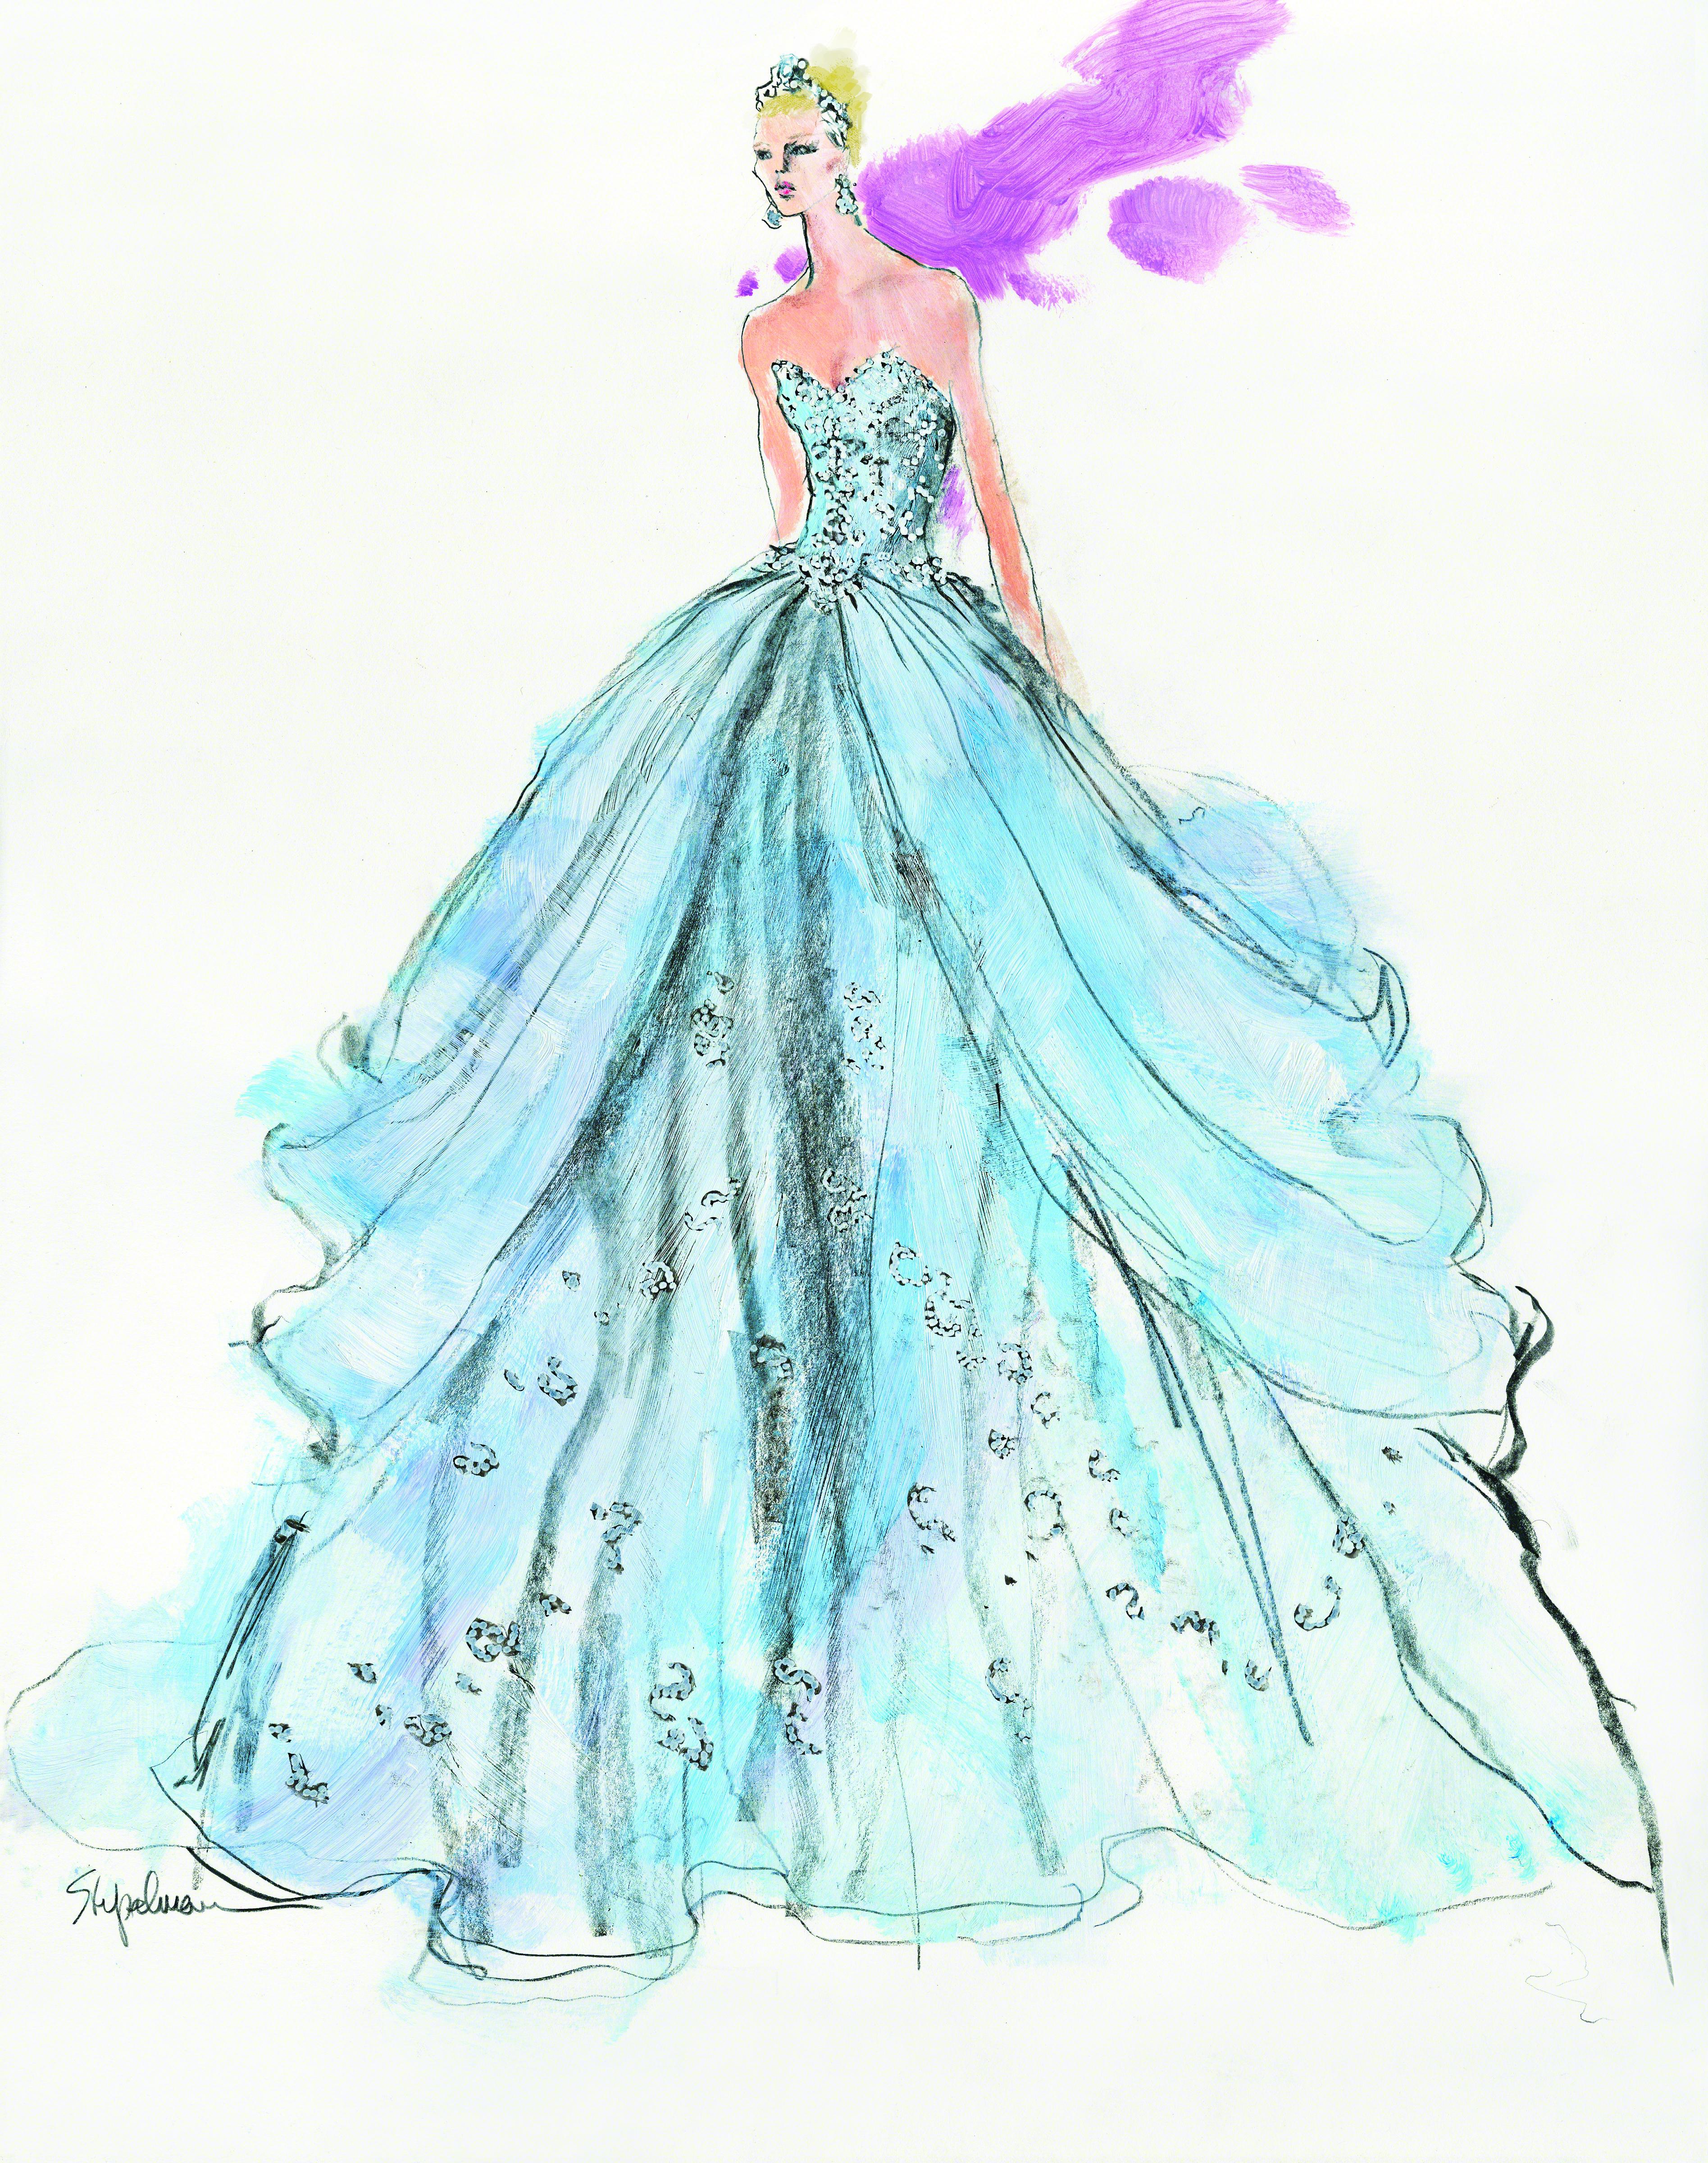 Unique Bridal Gown Sketches Ideas - All Wedding Dresses ...